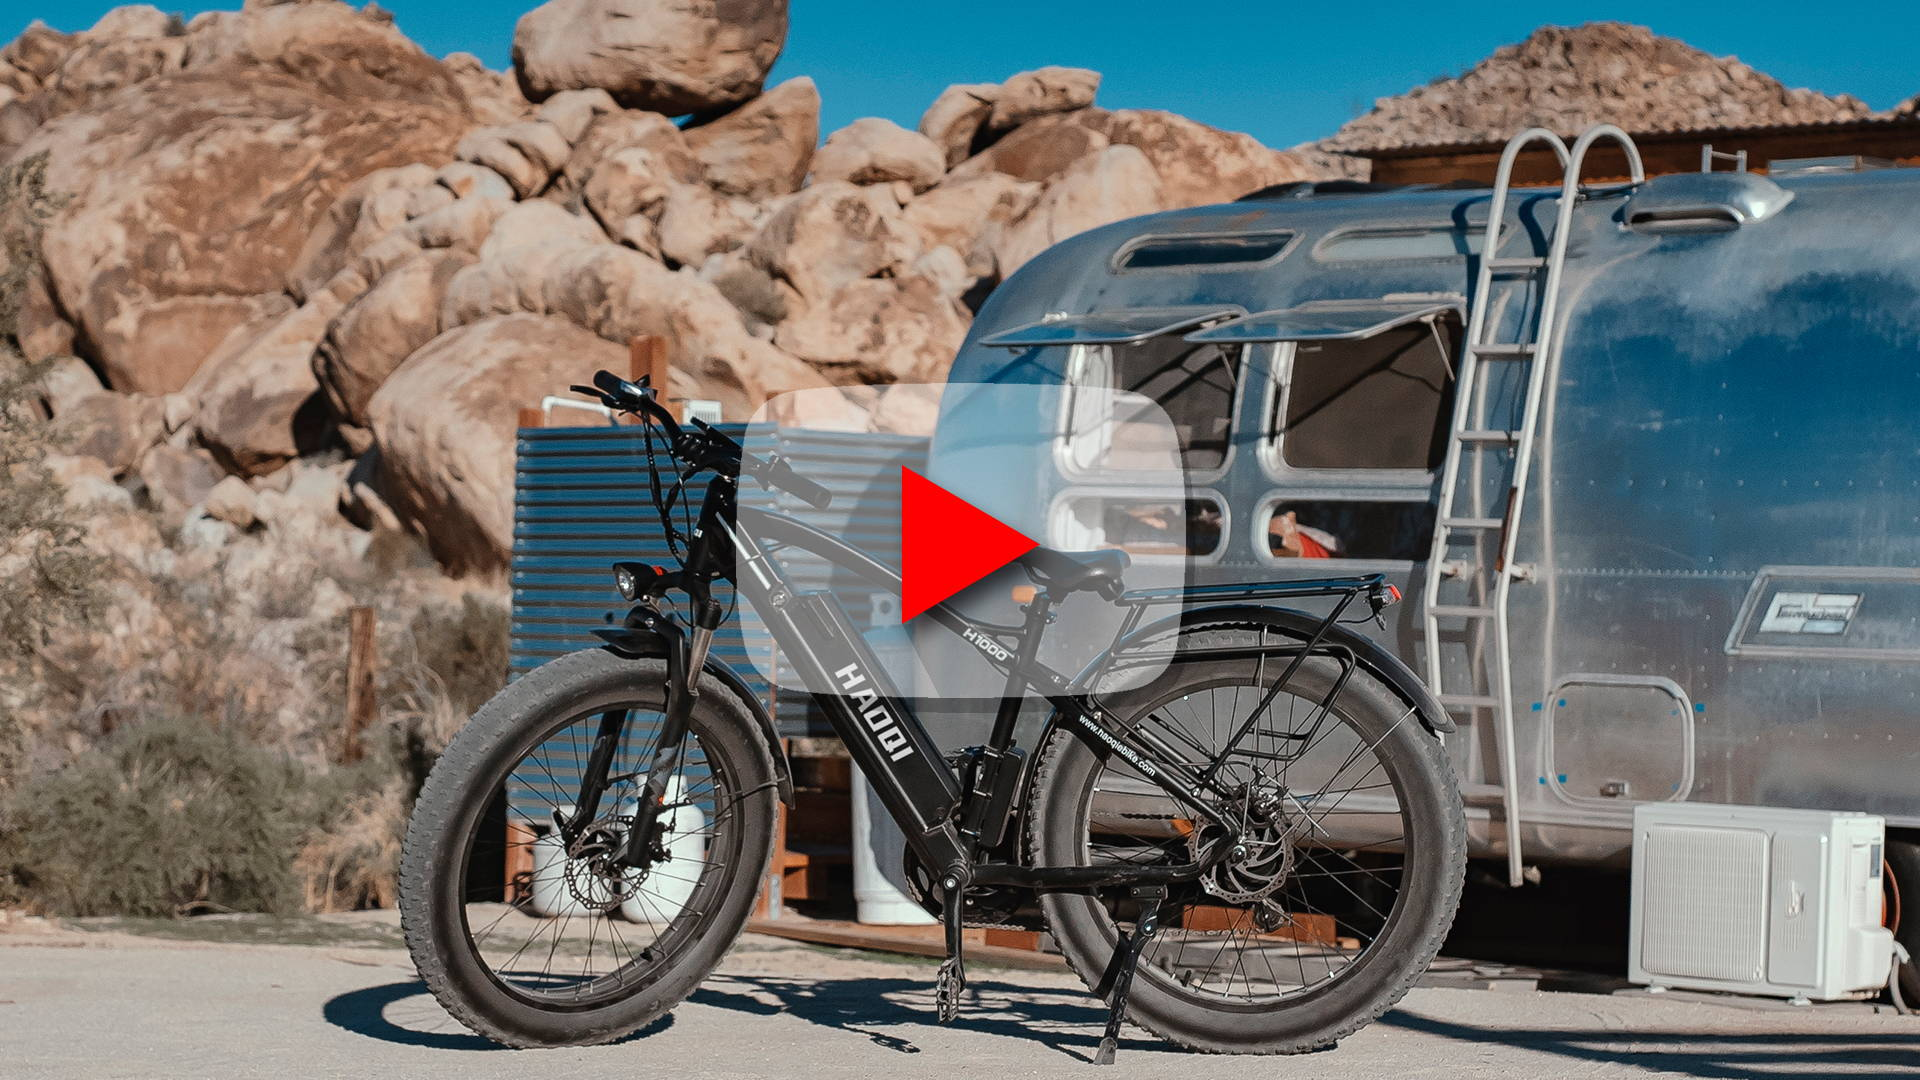 All Terrain Fat-Tire e Bike 2021 | Riding With HAOQI Adventure